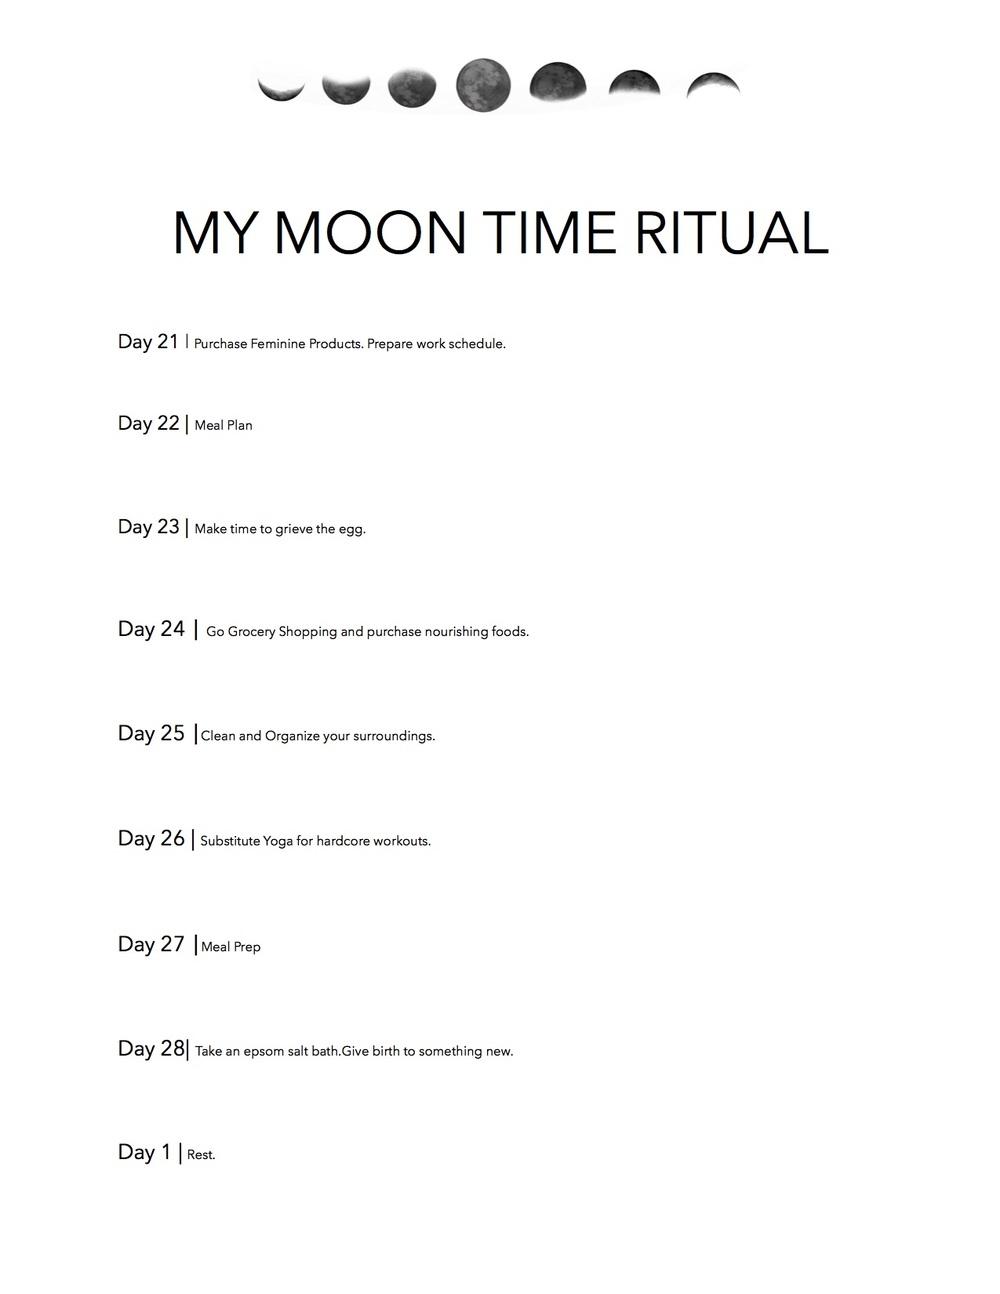 moontime ritual.jpg